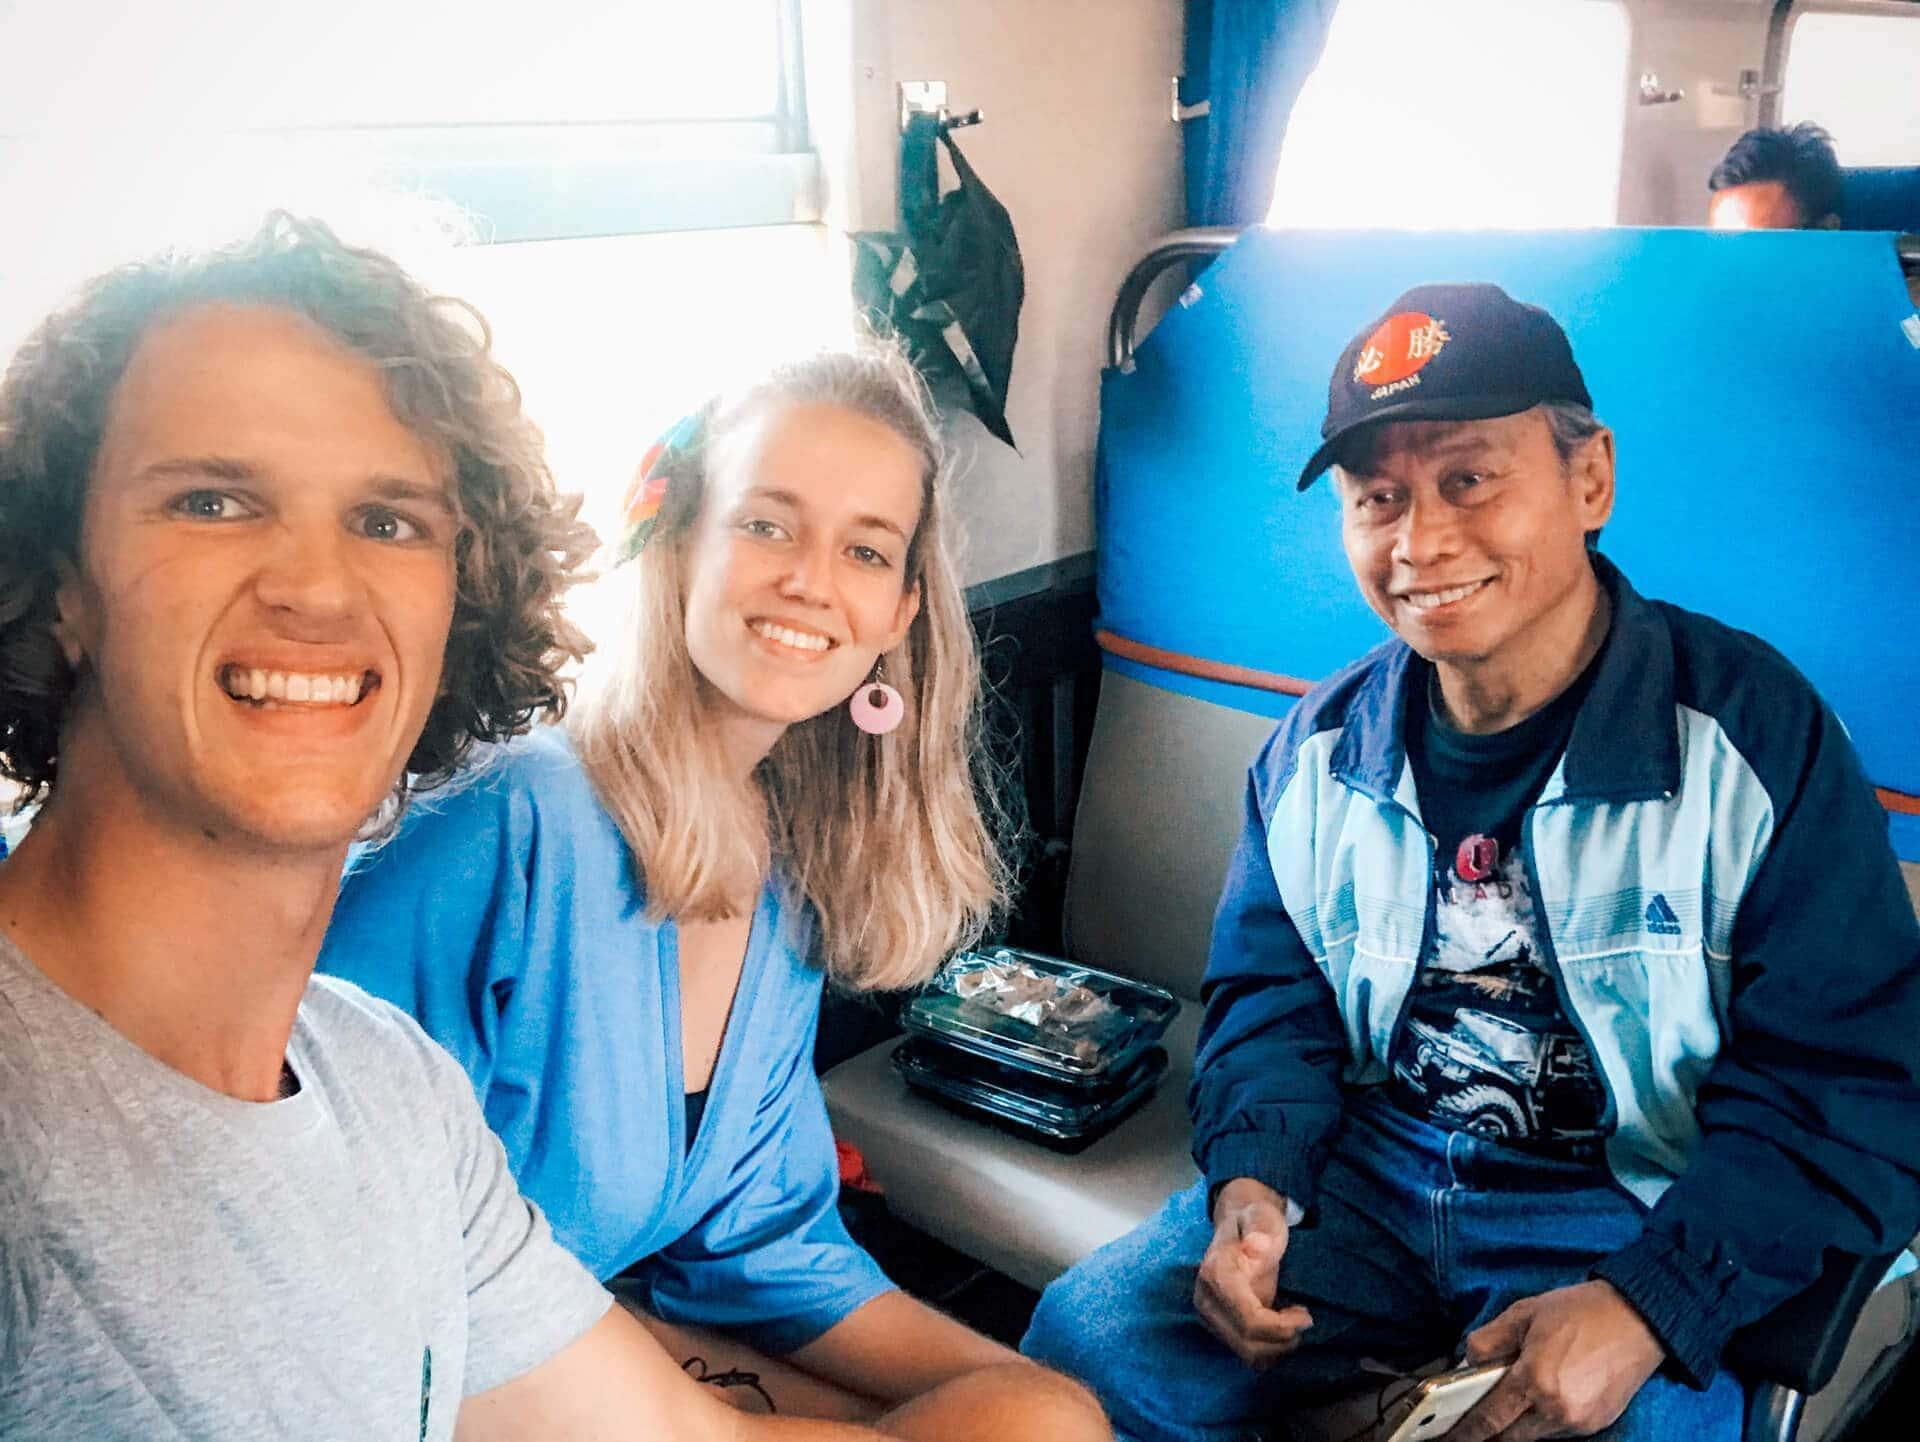 malioboro train yogyakarta malang local people